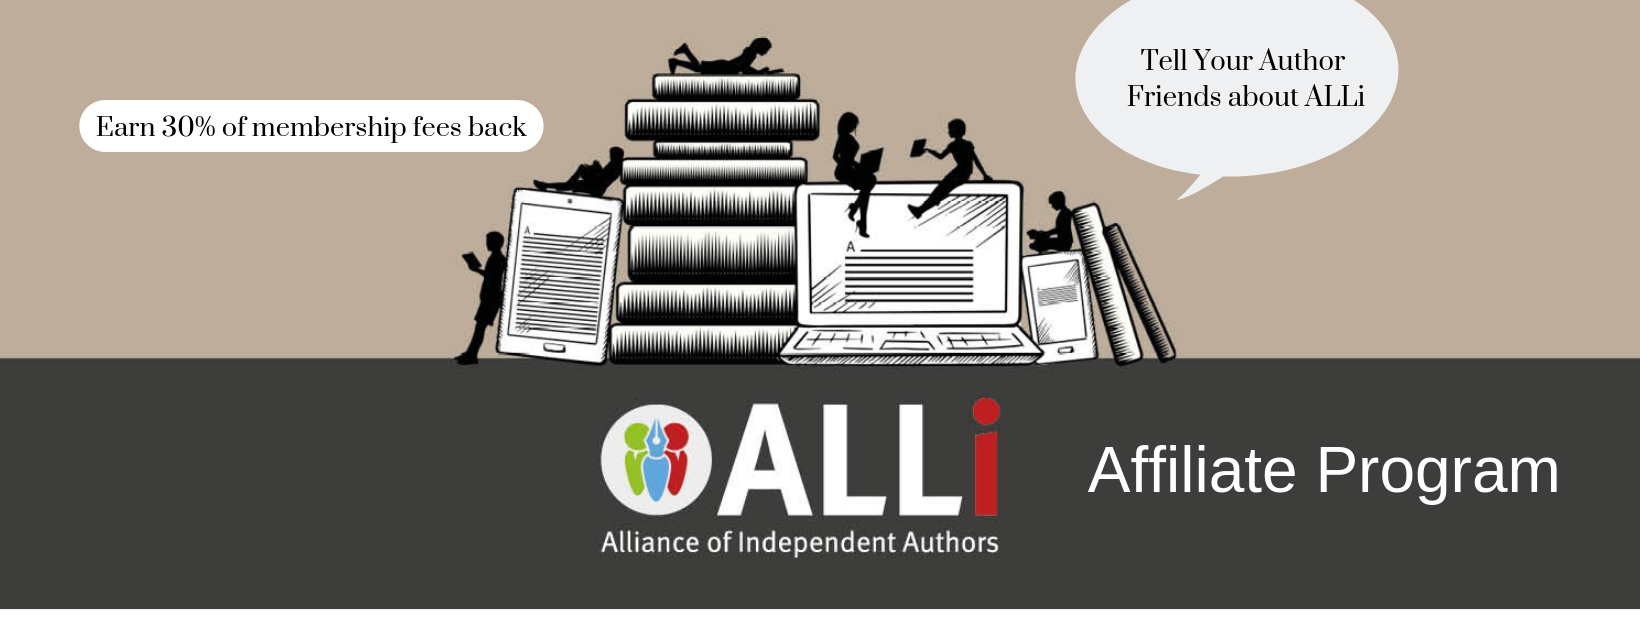 Alliance of Independent Authors Affiliate Program